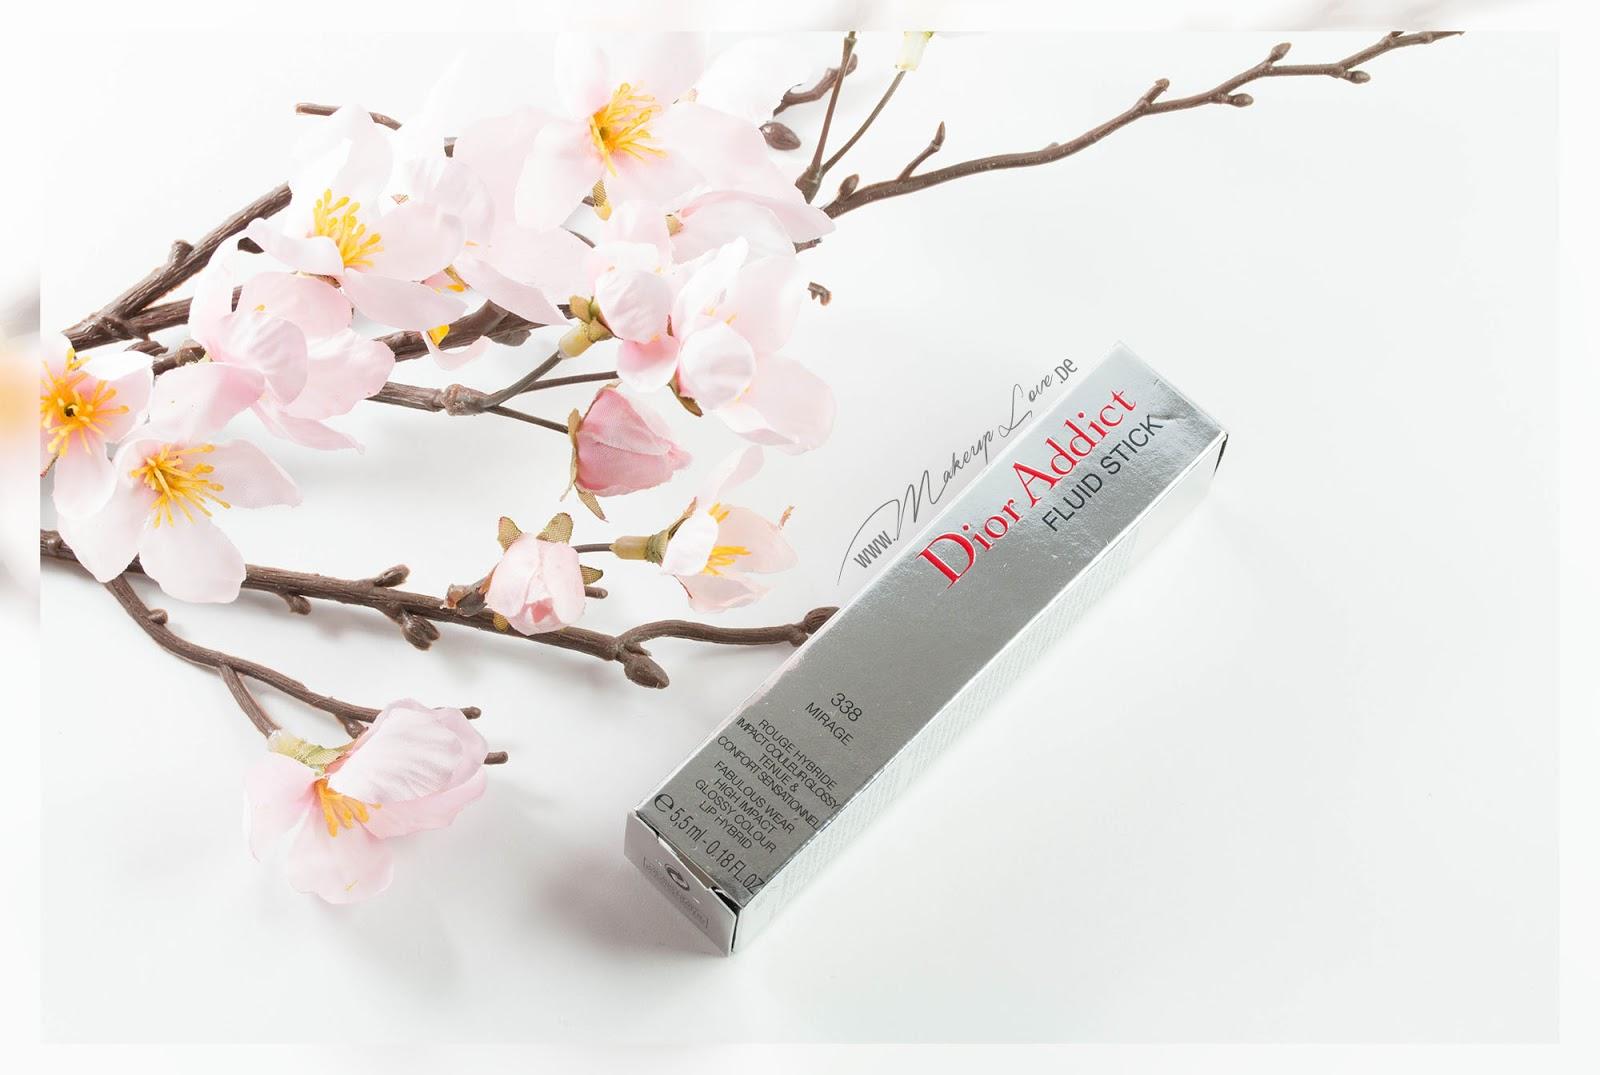 Dior Addict Fluid Stick Mirage